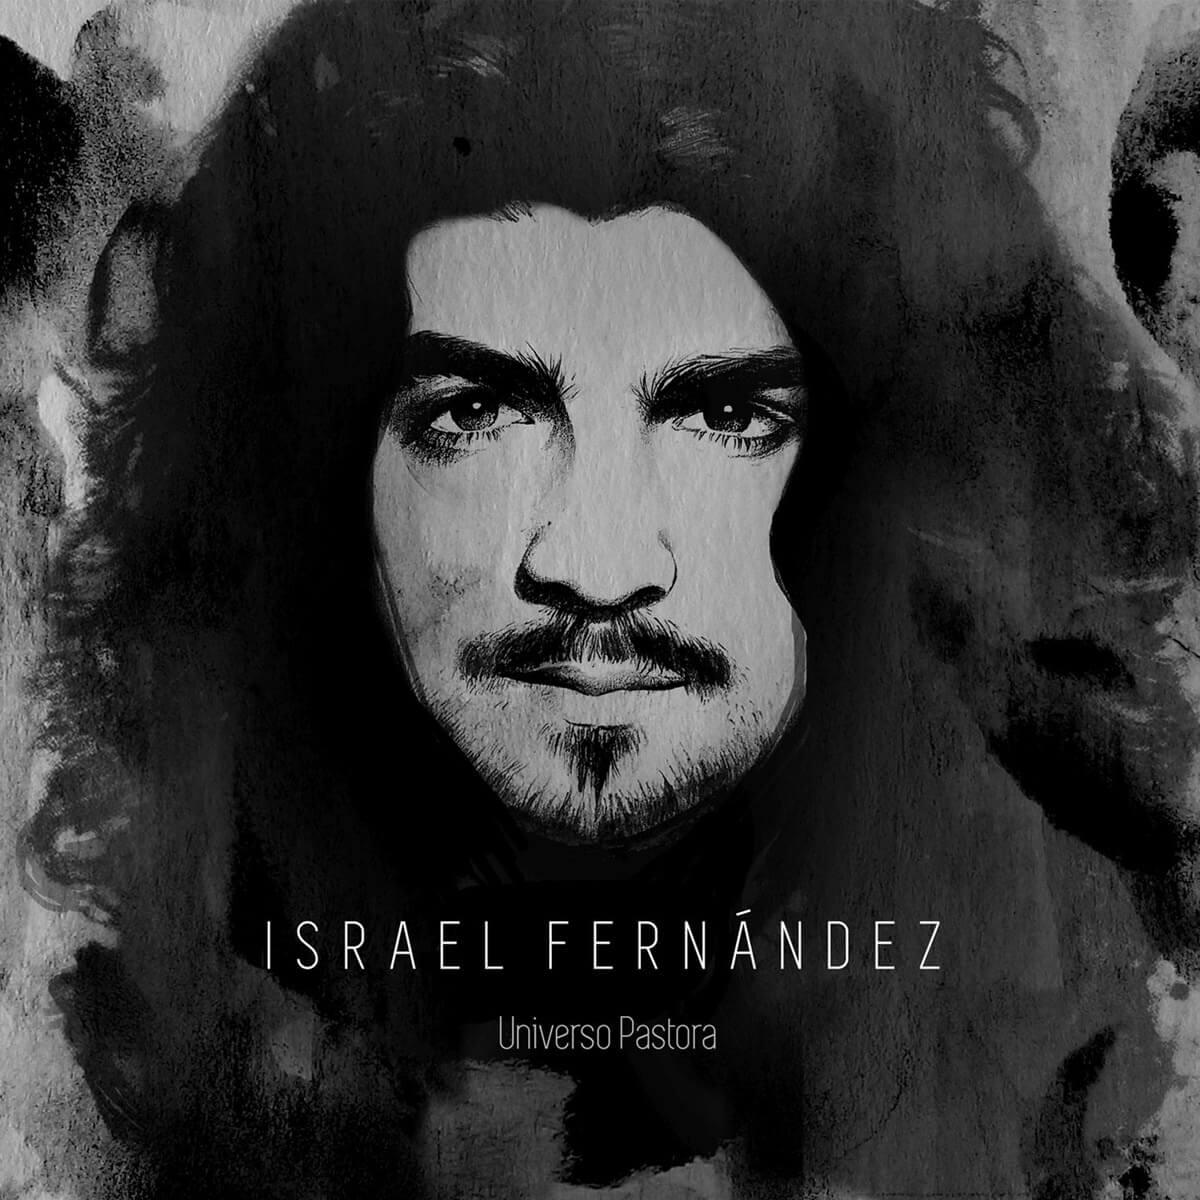 Discos 2018 - Israel Fernández